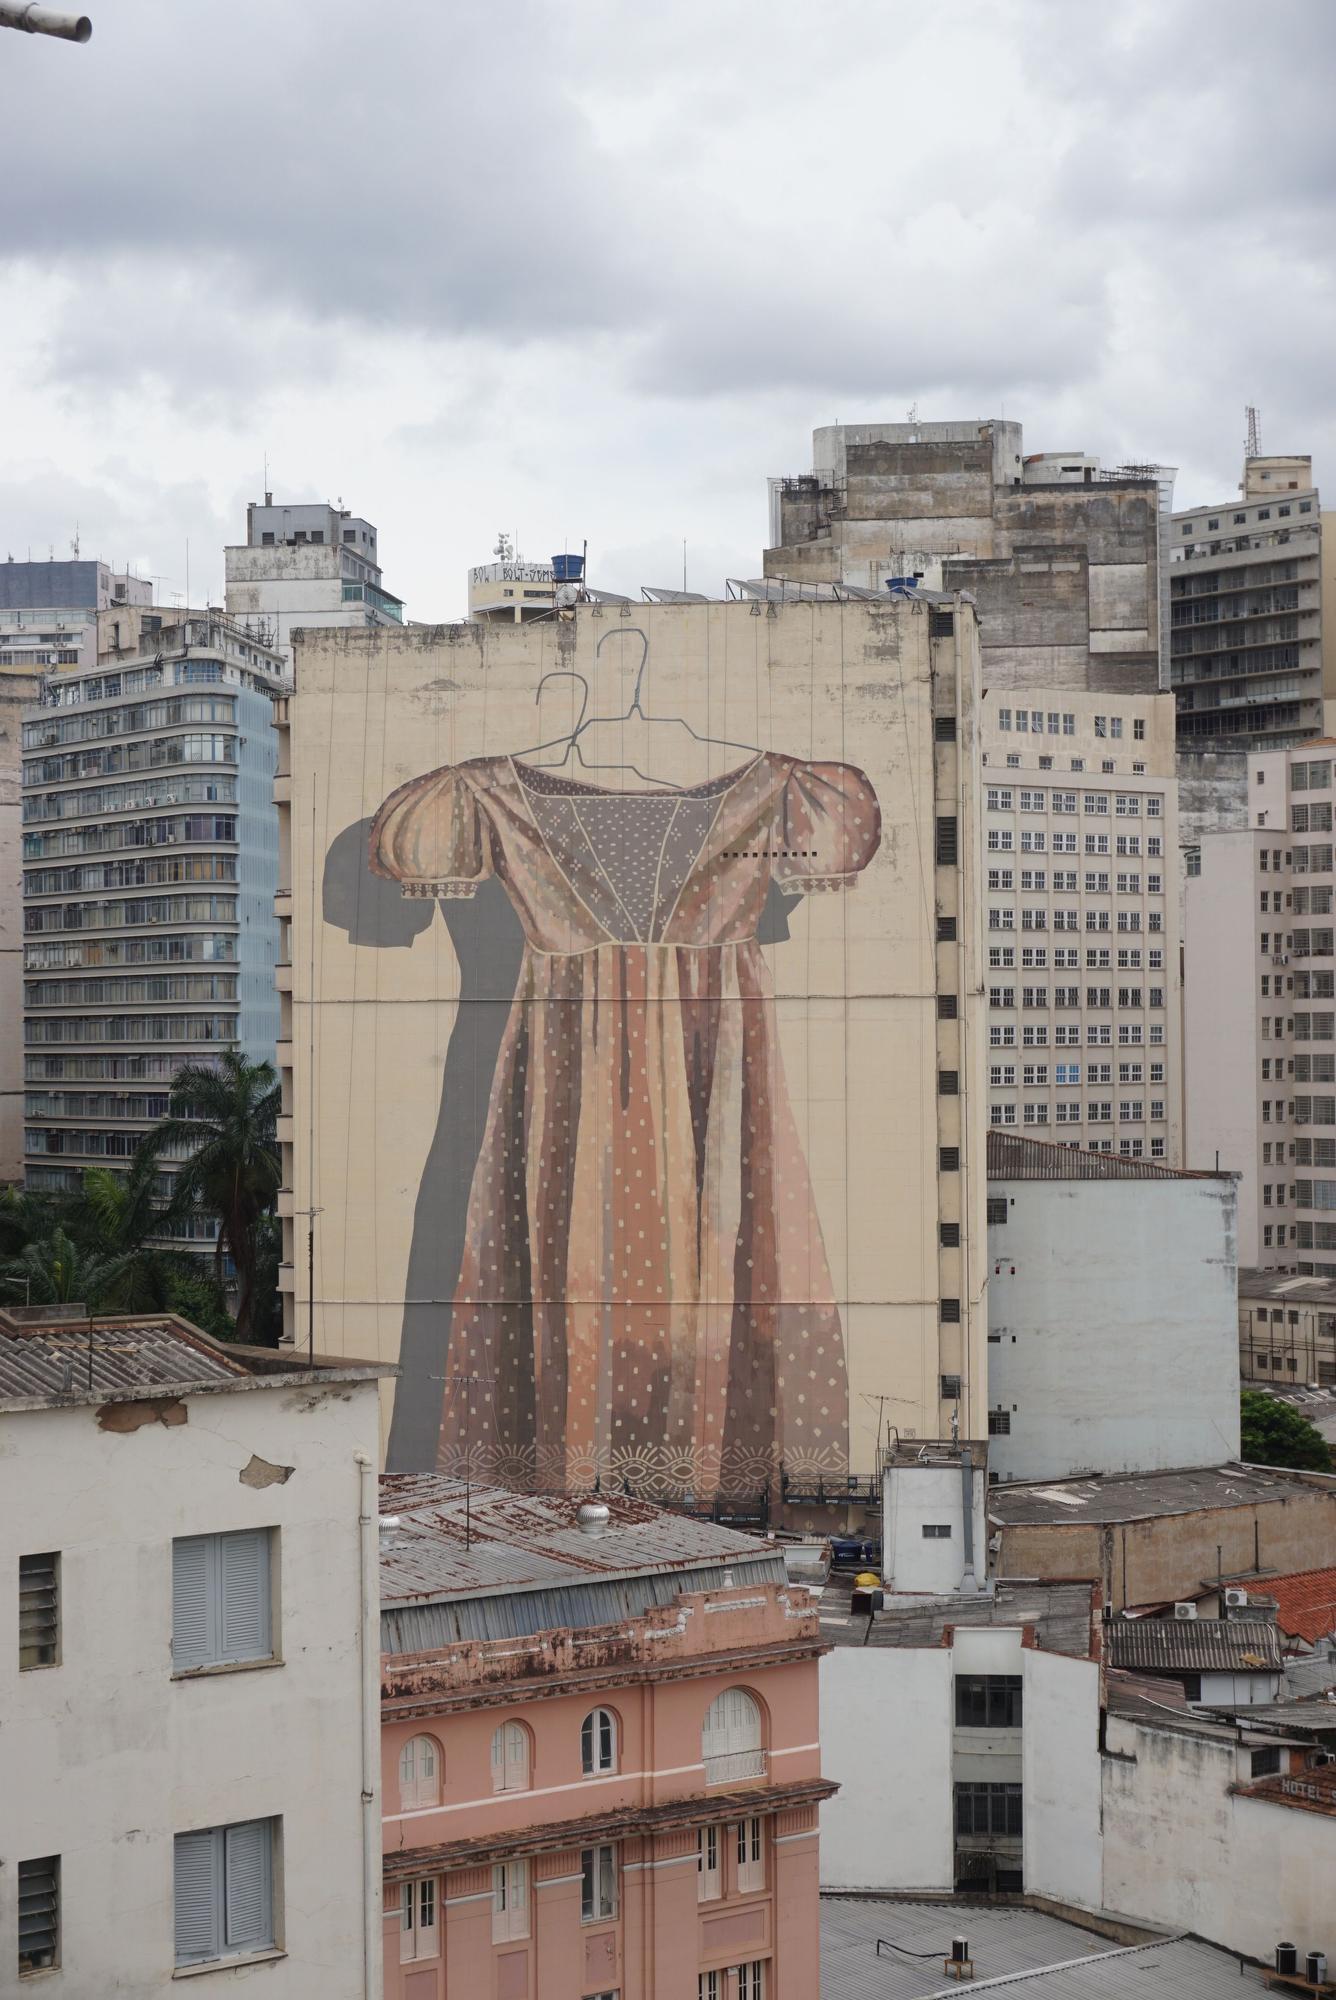 Muere en València la artista urbana Hyuro